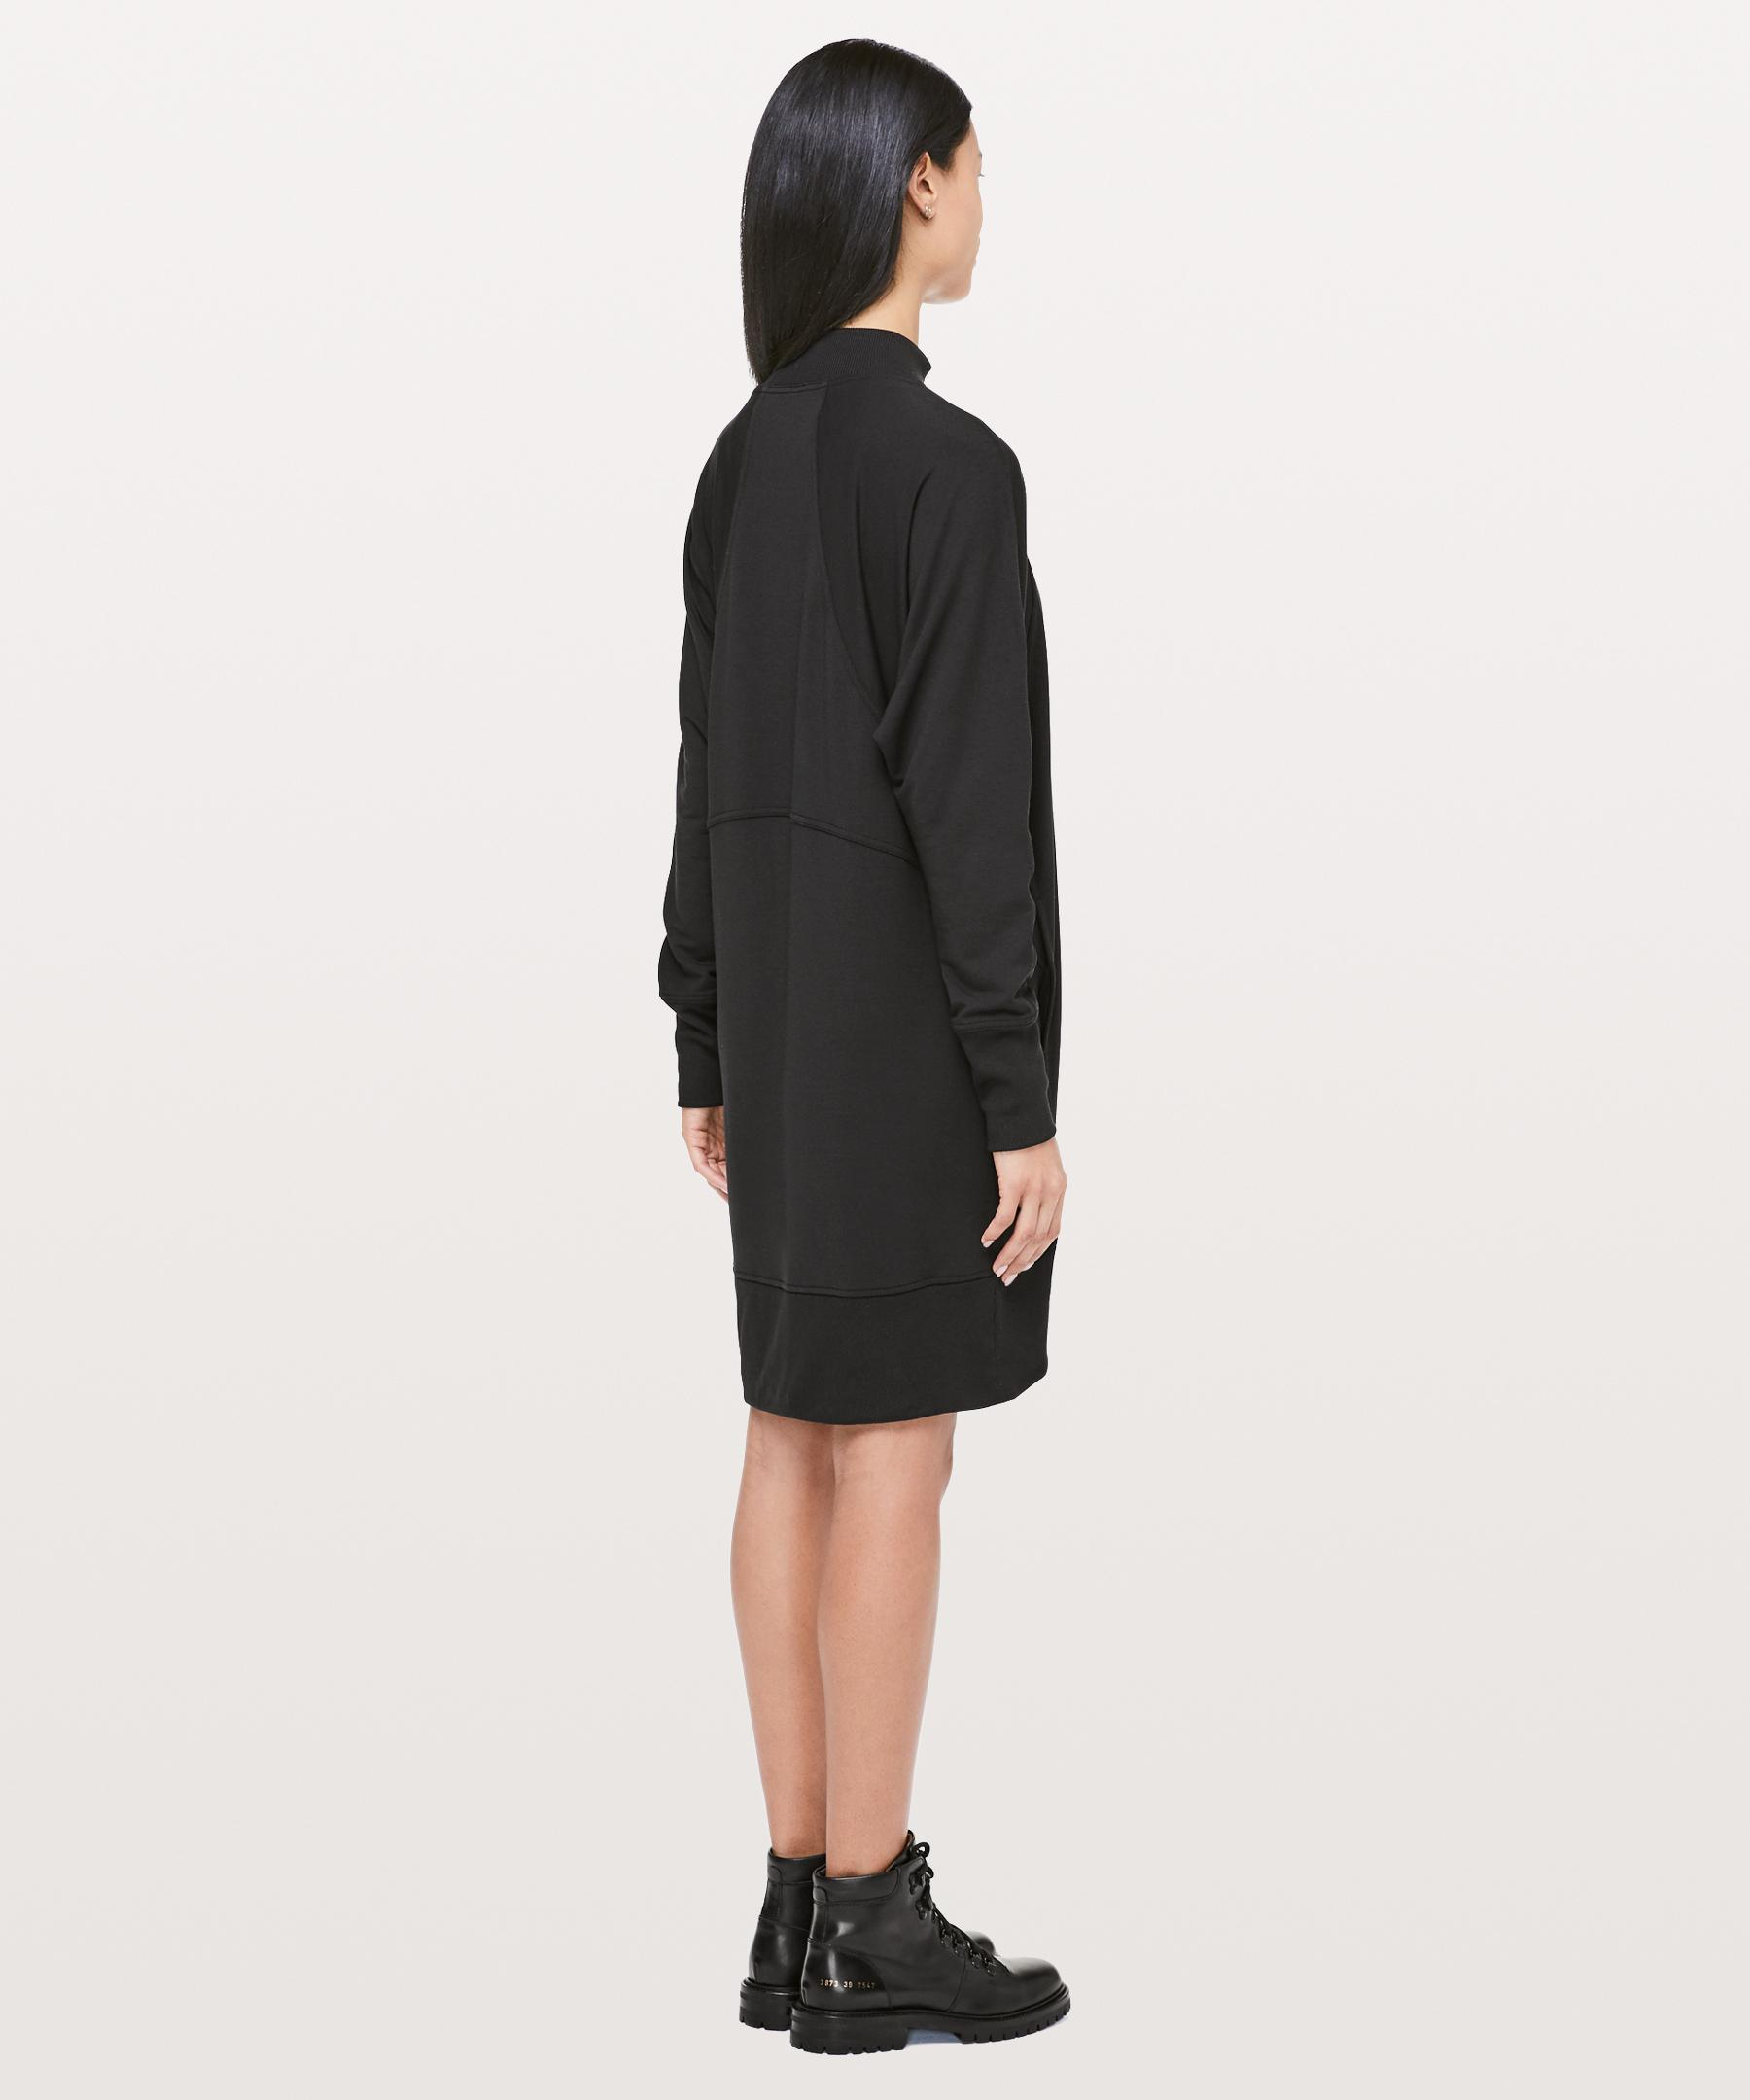 eef47f73bb lululemon athletica Cozy Instincts Dress in Black - Lyst